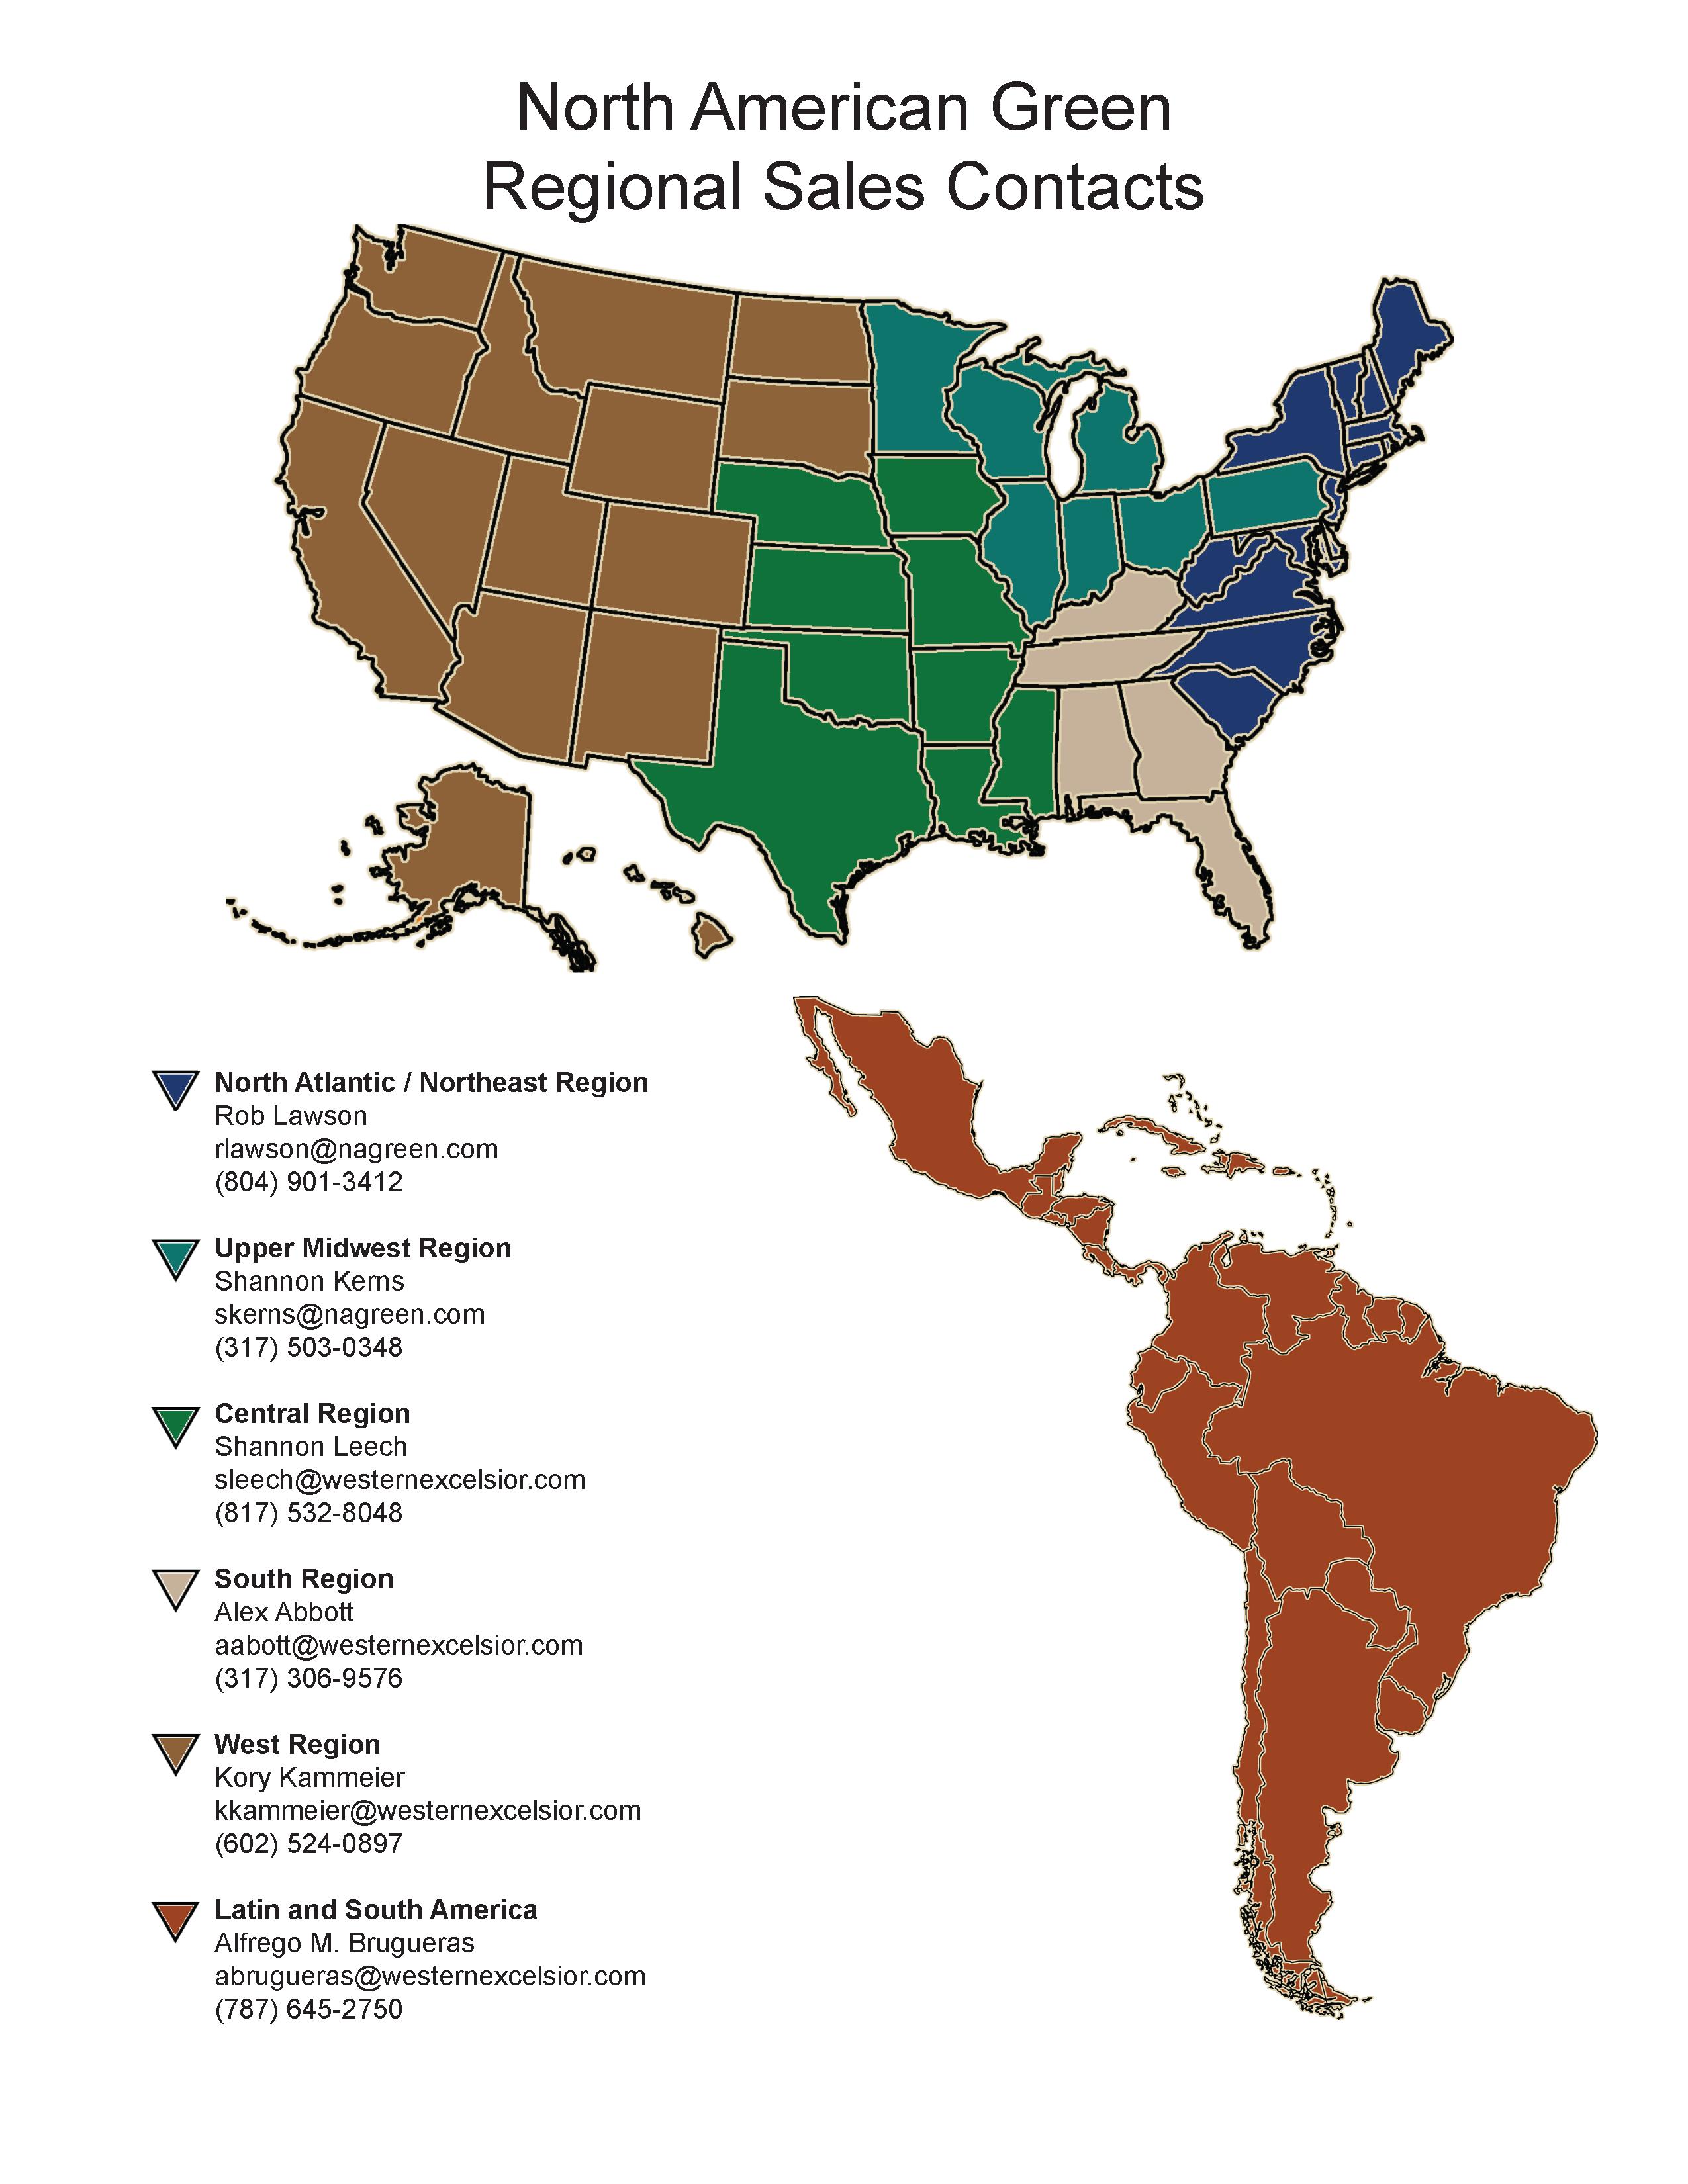 Blank Map South America World Regional Printable Maps Royalty Free - Blank us map west region